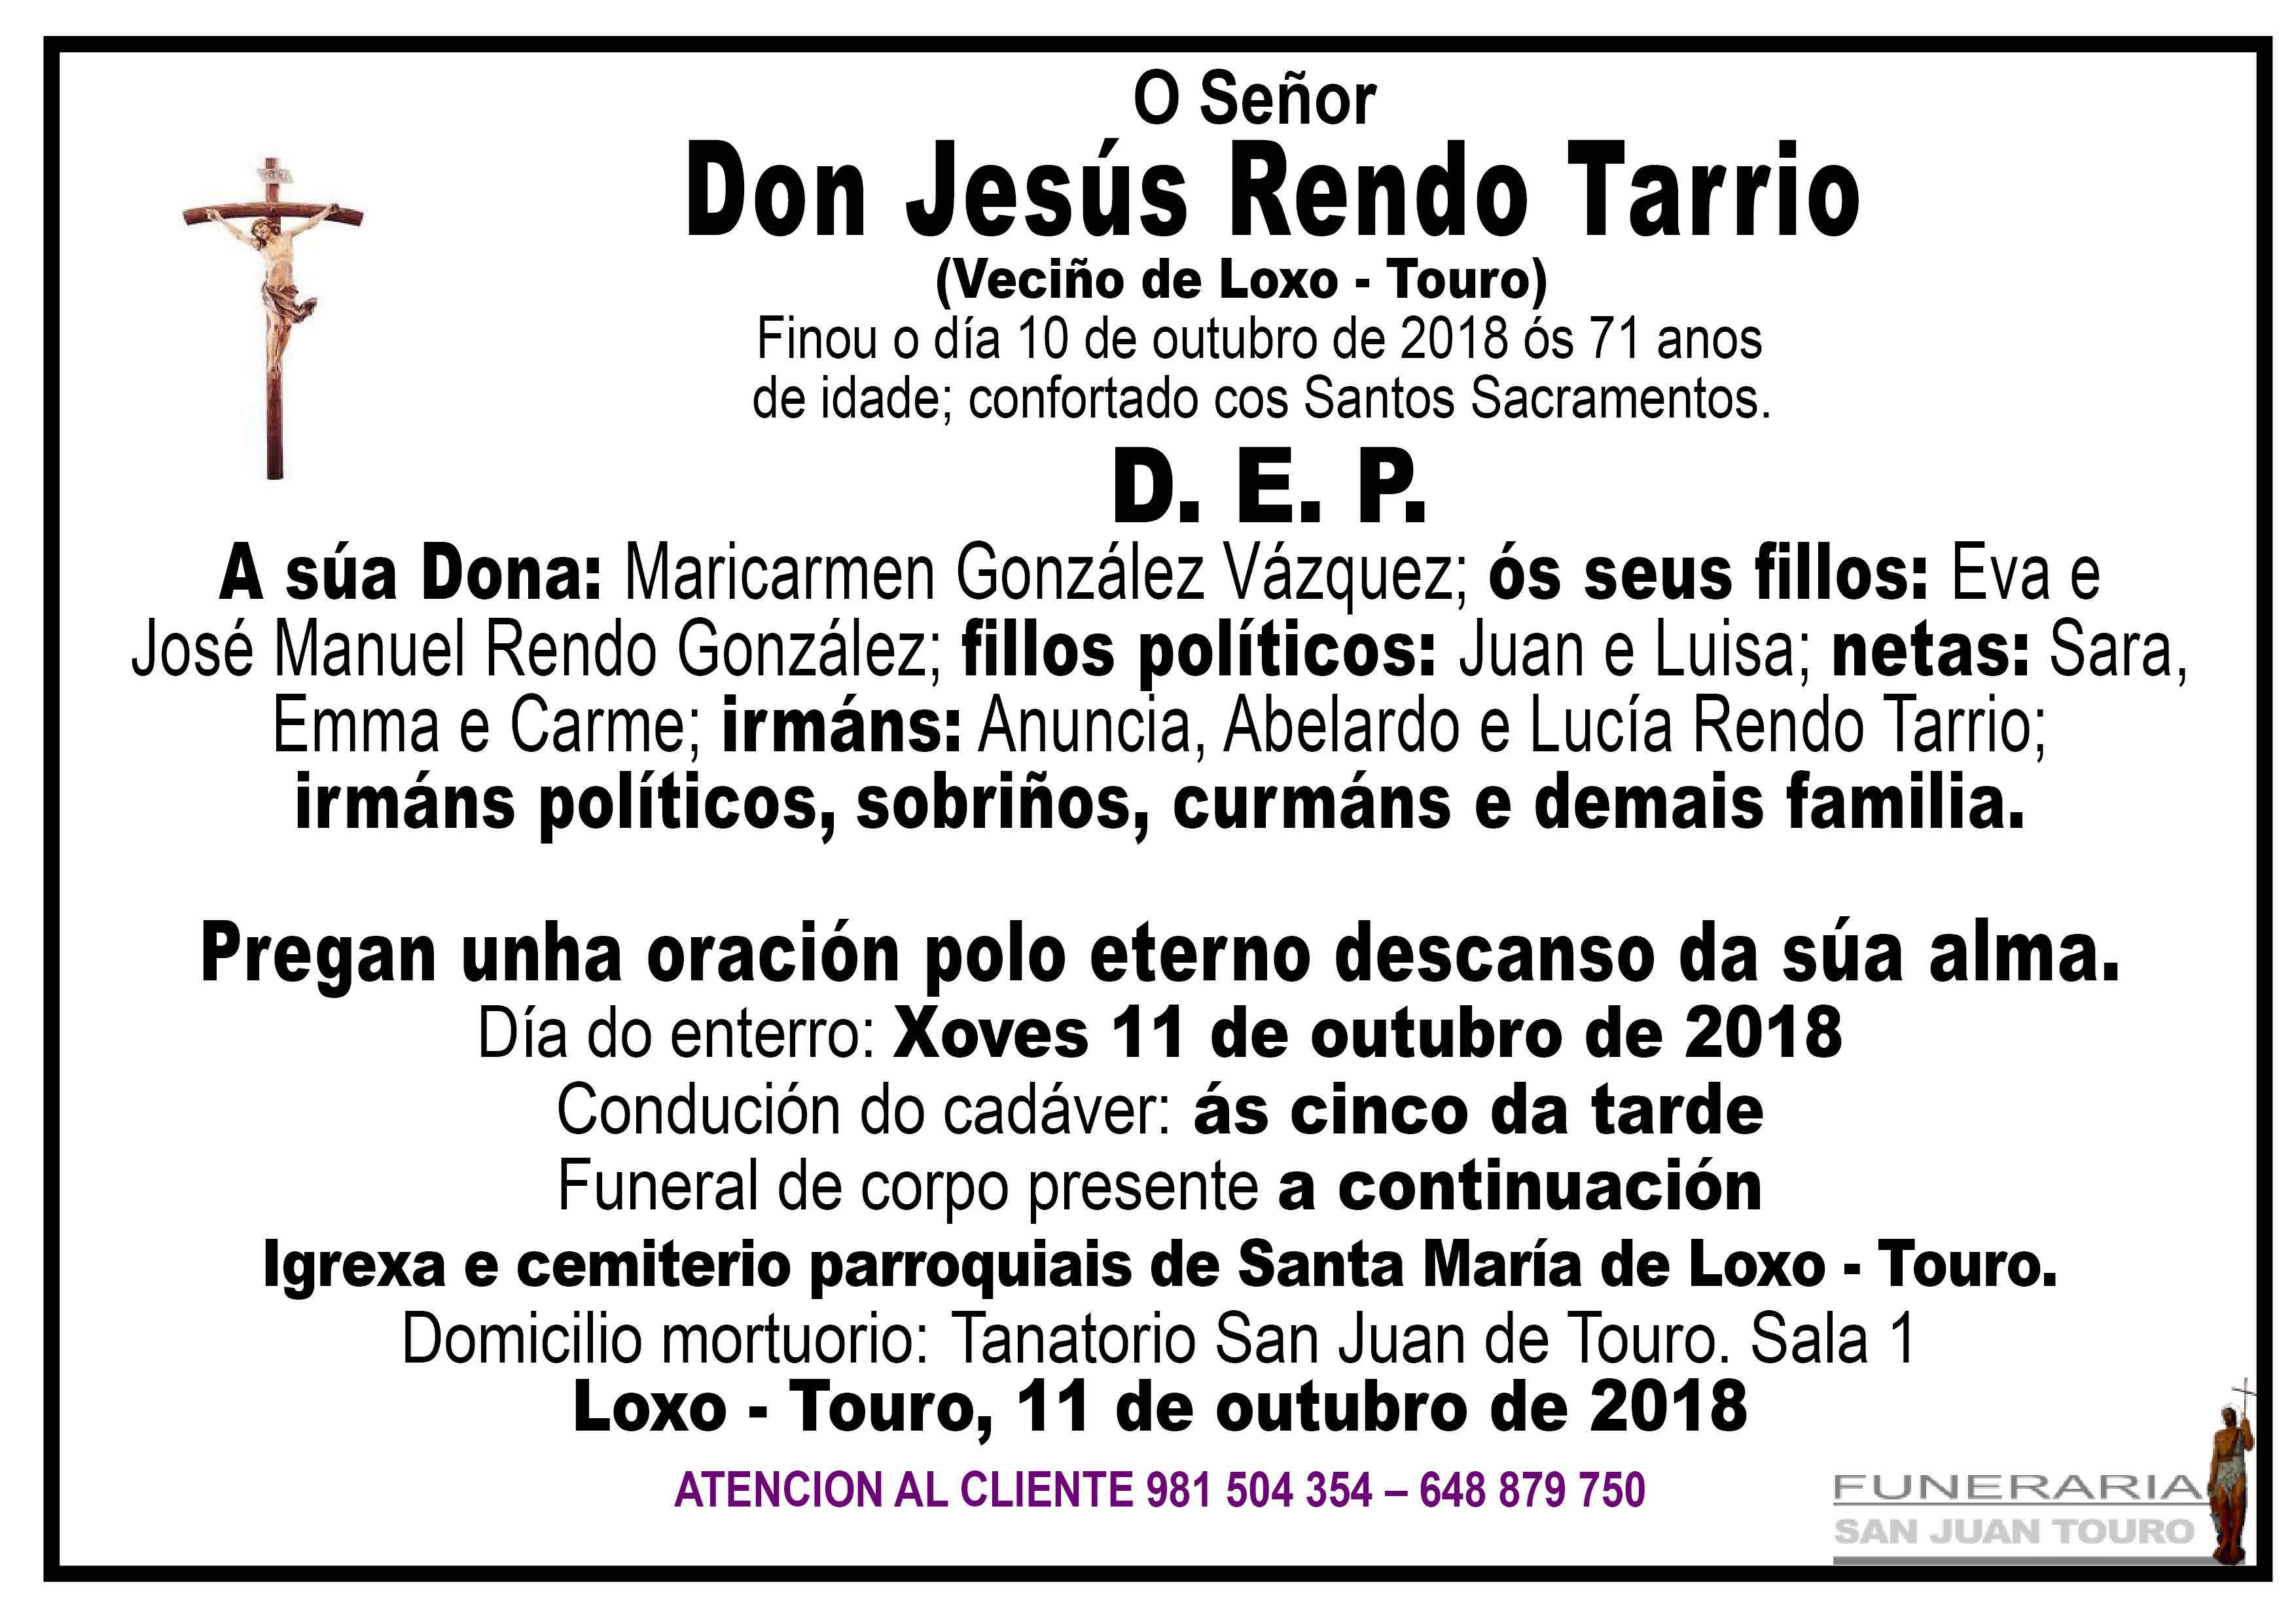 Esquela de SEPELIO DE DON JESÚS RENDO TARRIO